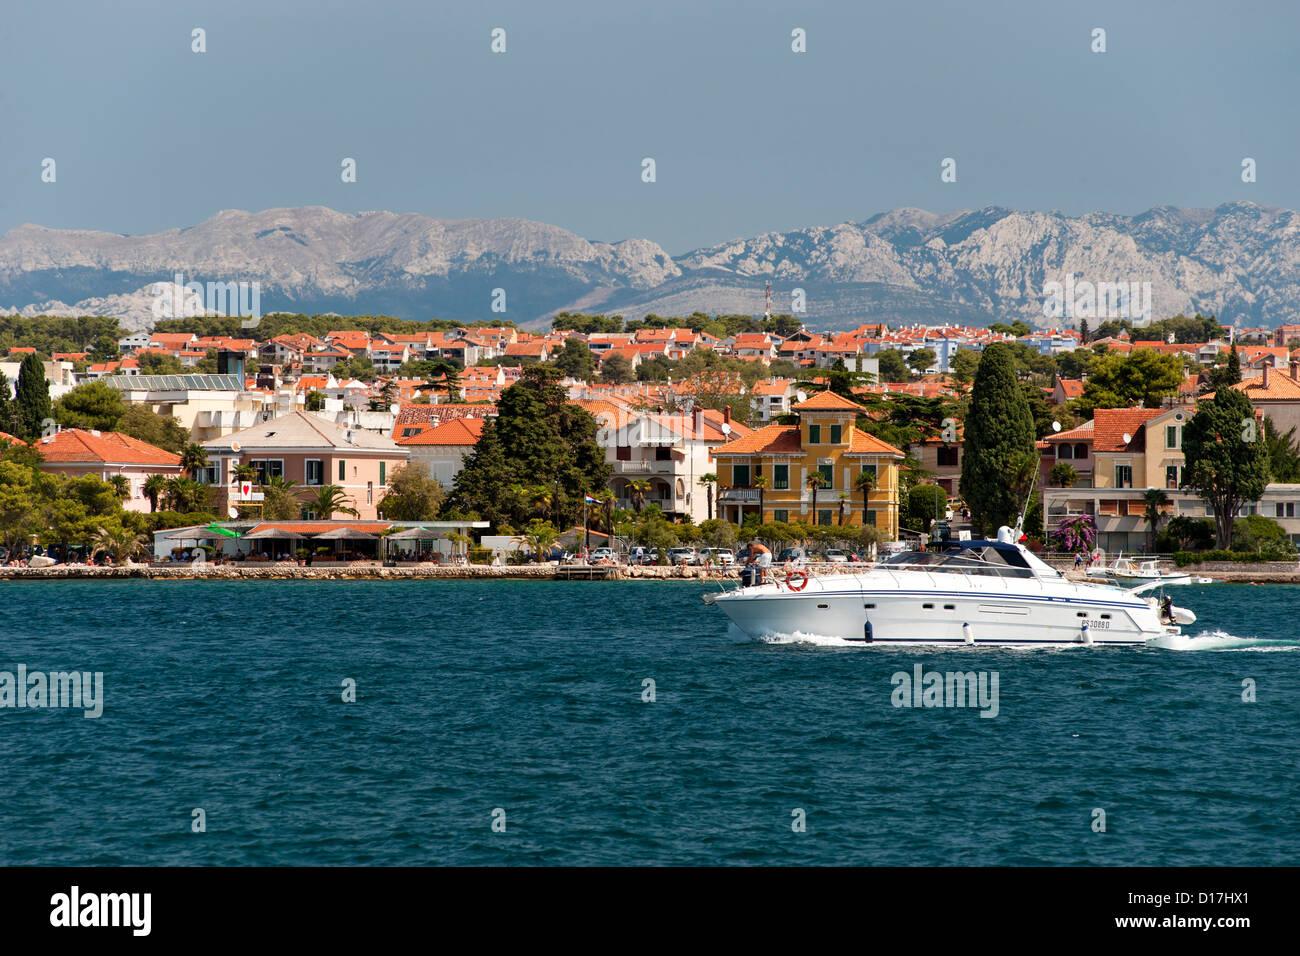 View of the coastline near Zadar on the Adriatic coast of Croatia. - Stock Image